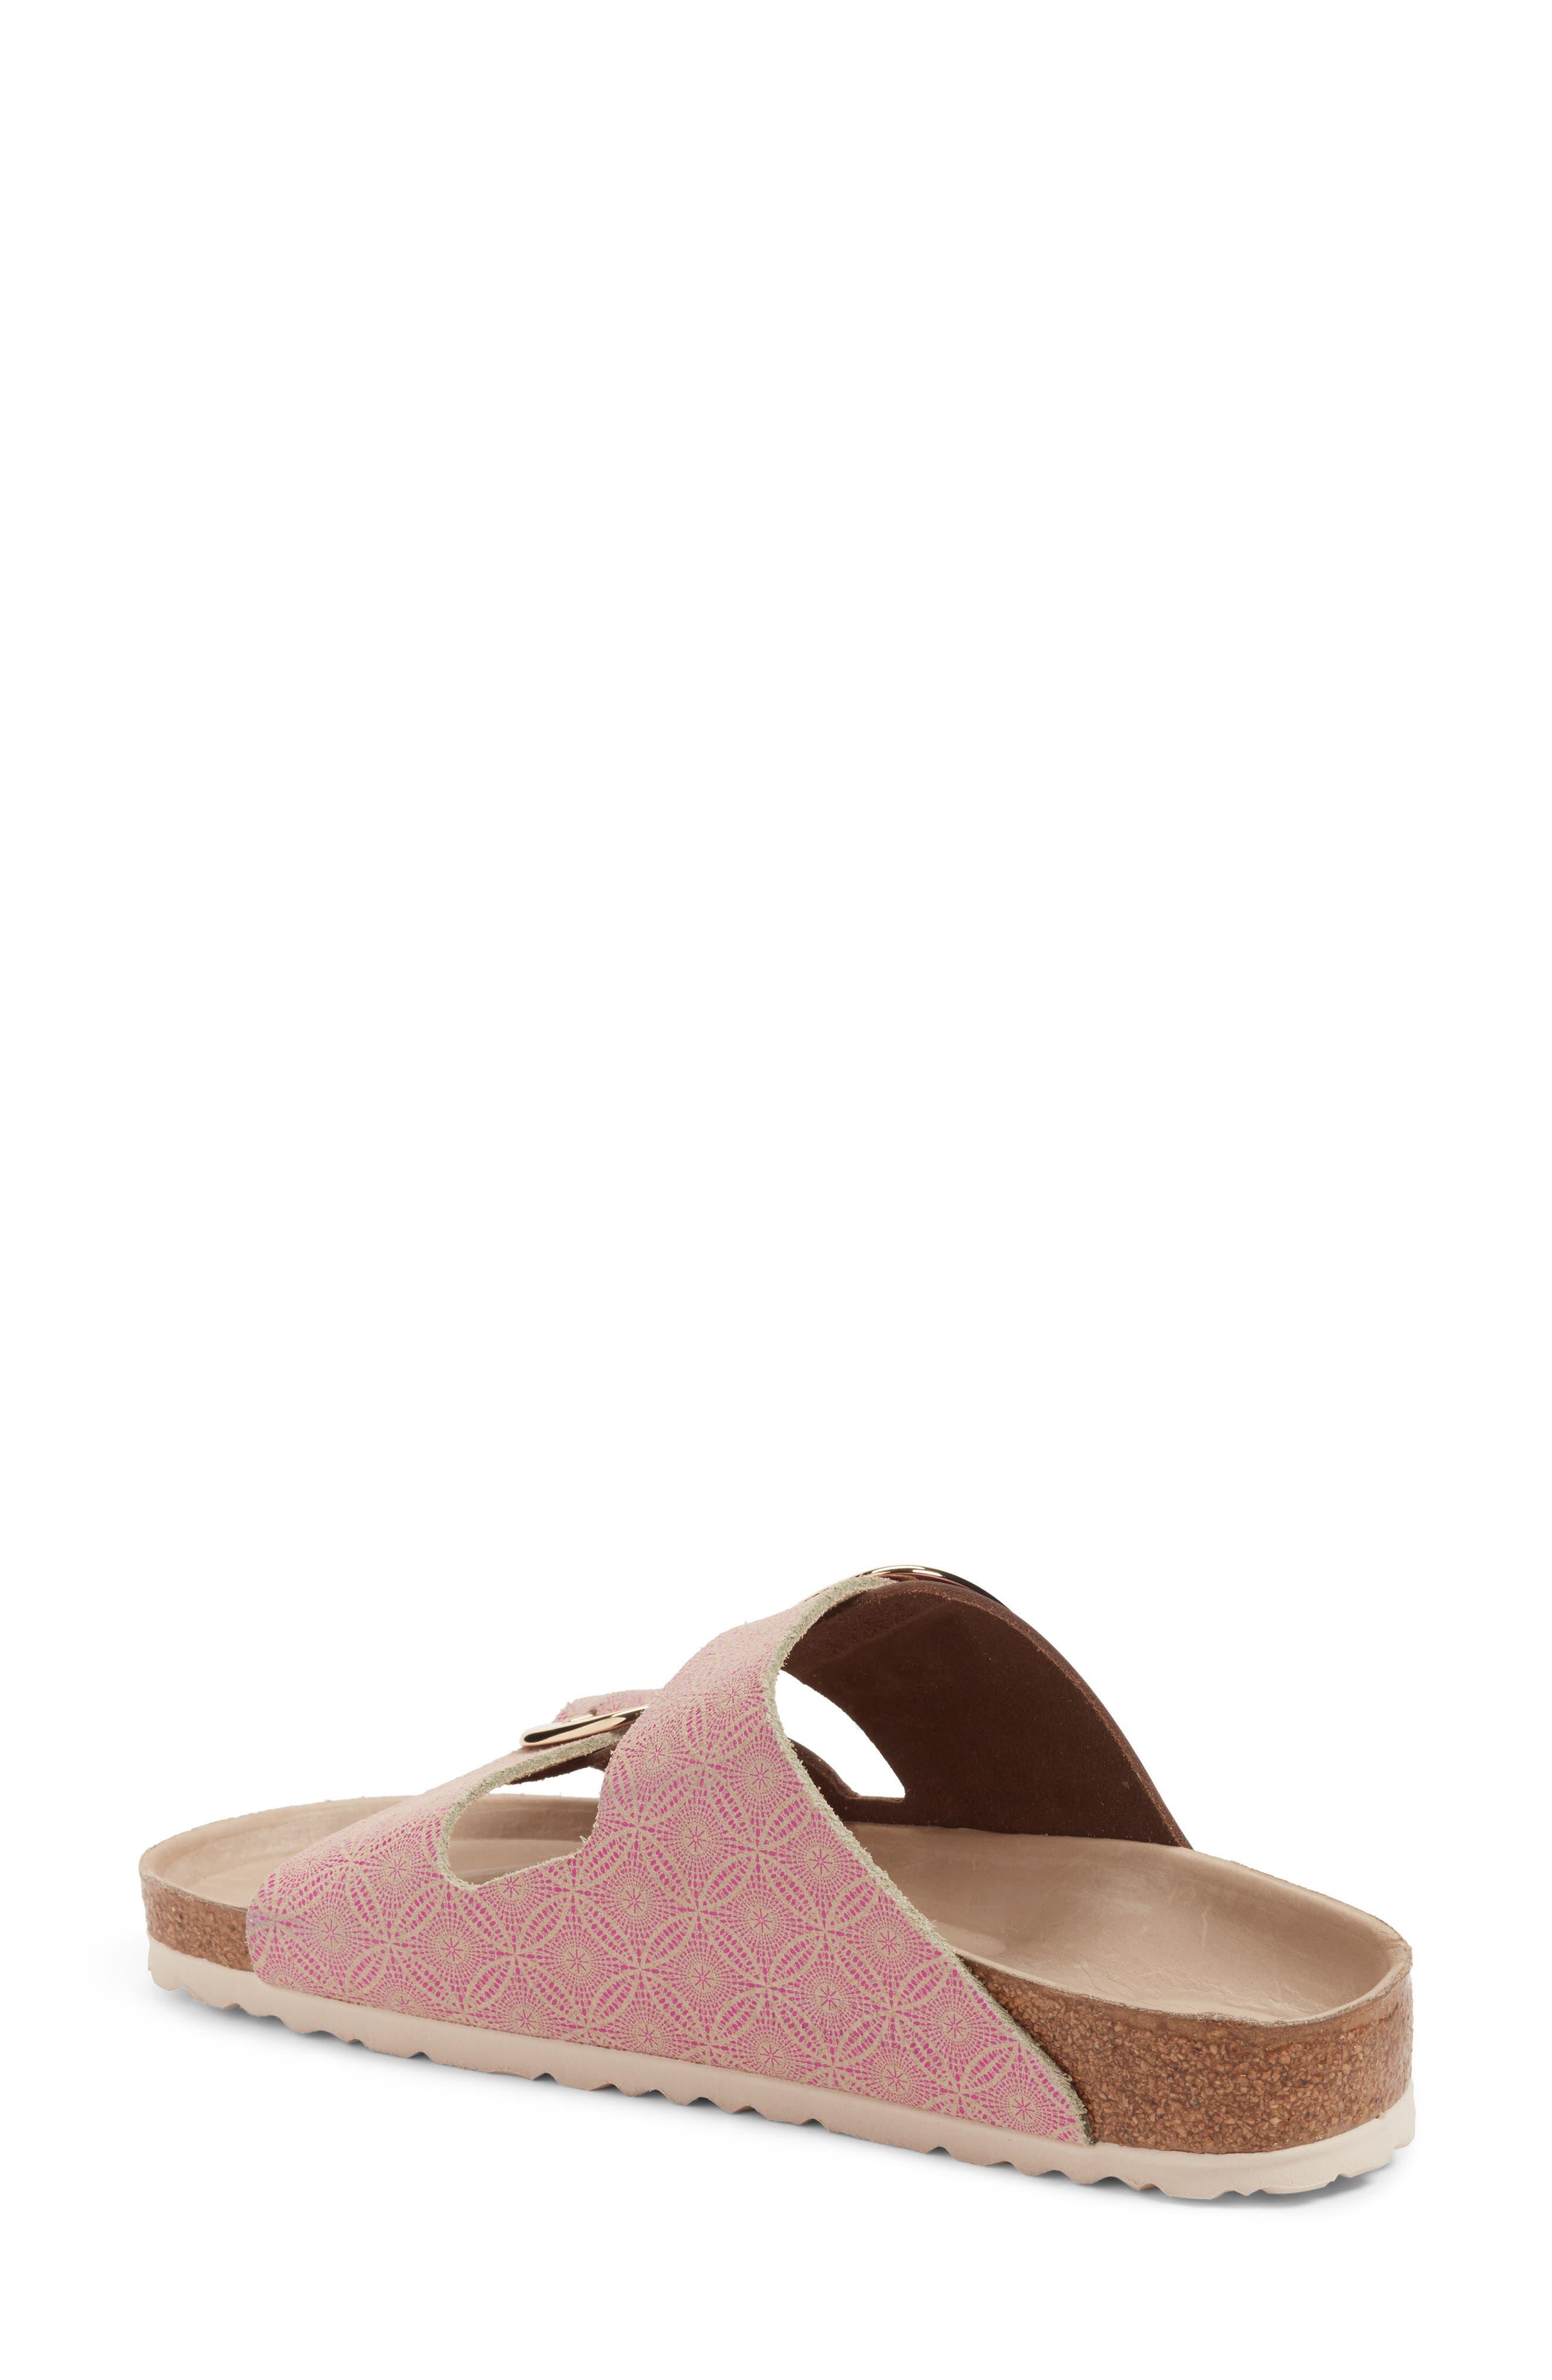 Arizona Big Buckle Slide Sandal,                             Alternate thumbnail 2, color,                             Ceramic Rose Leather